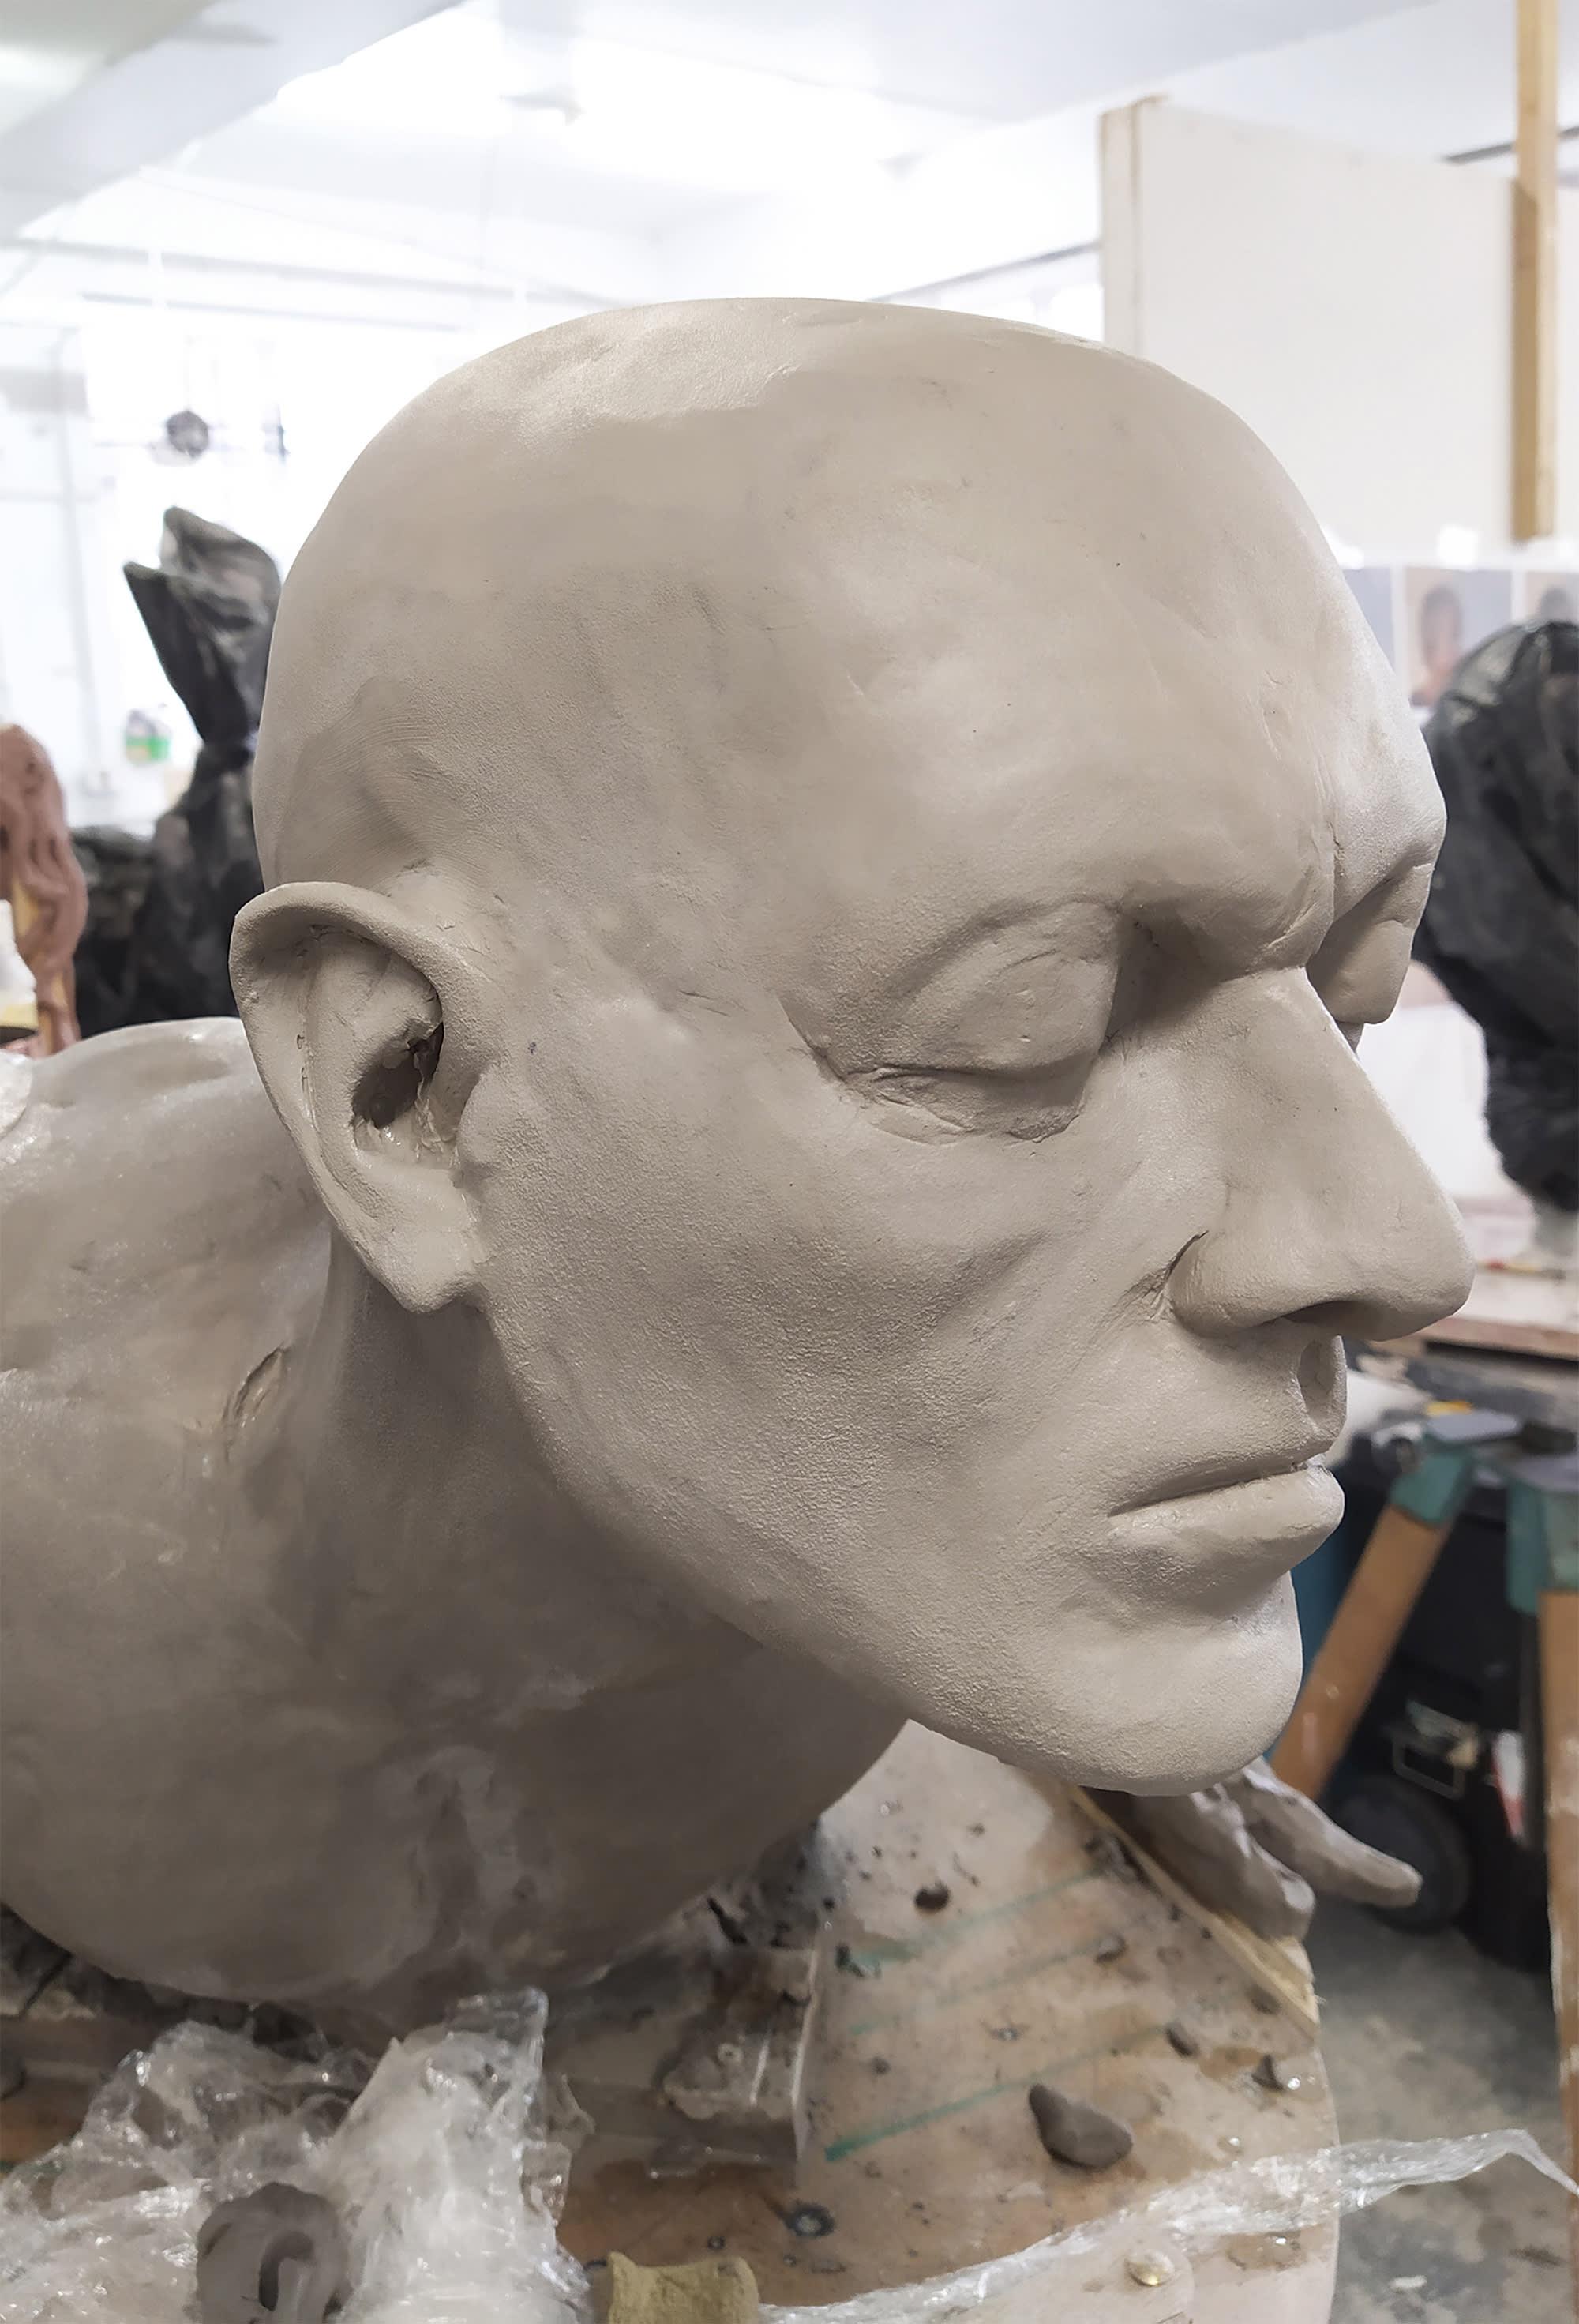 Jamie-Rochford-Assimilation-of-the-human-form-model-work-in-progress-3.jpg